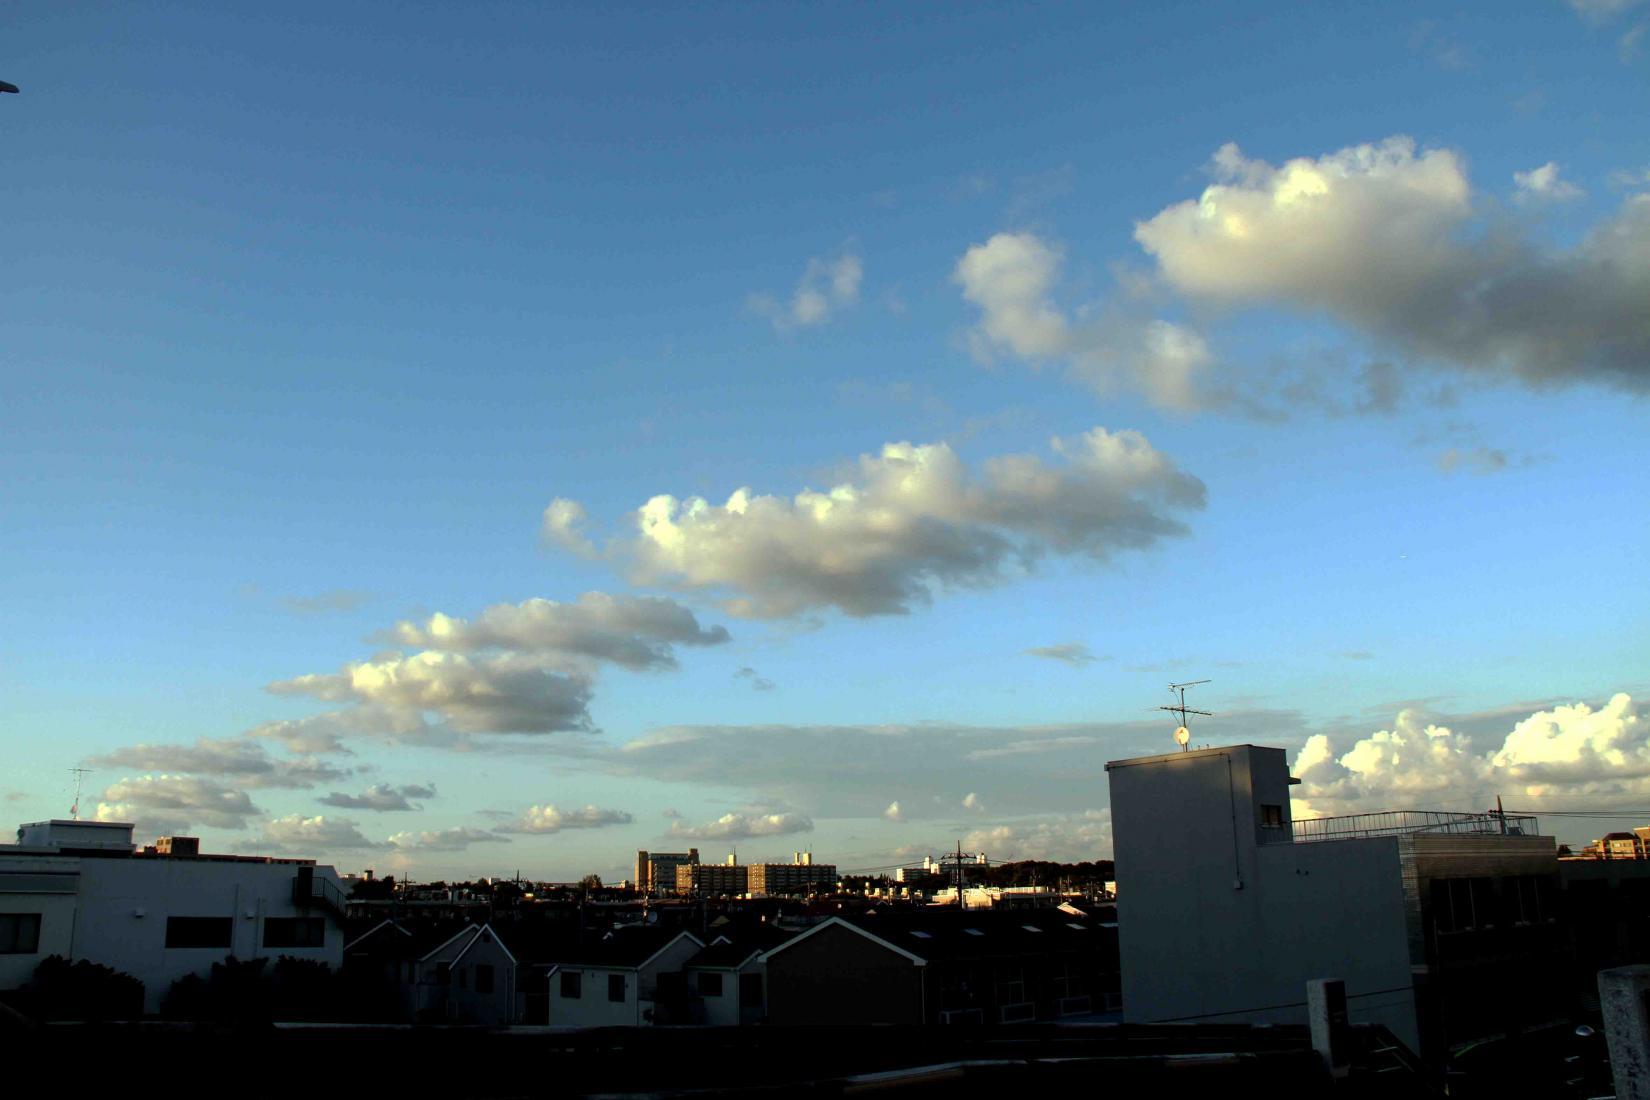 環八雲 20120819(18) 17時59分 上用賀5丁目付近から北方面